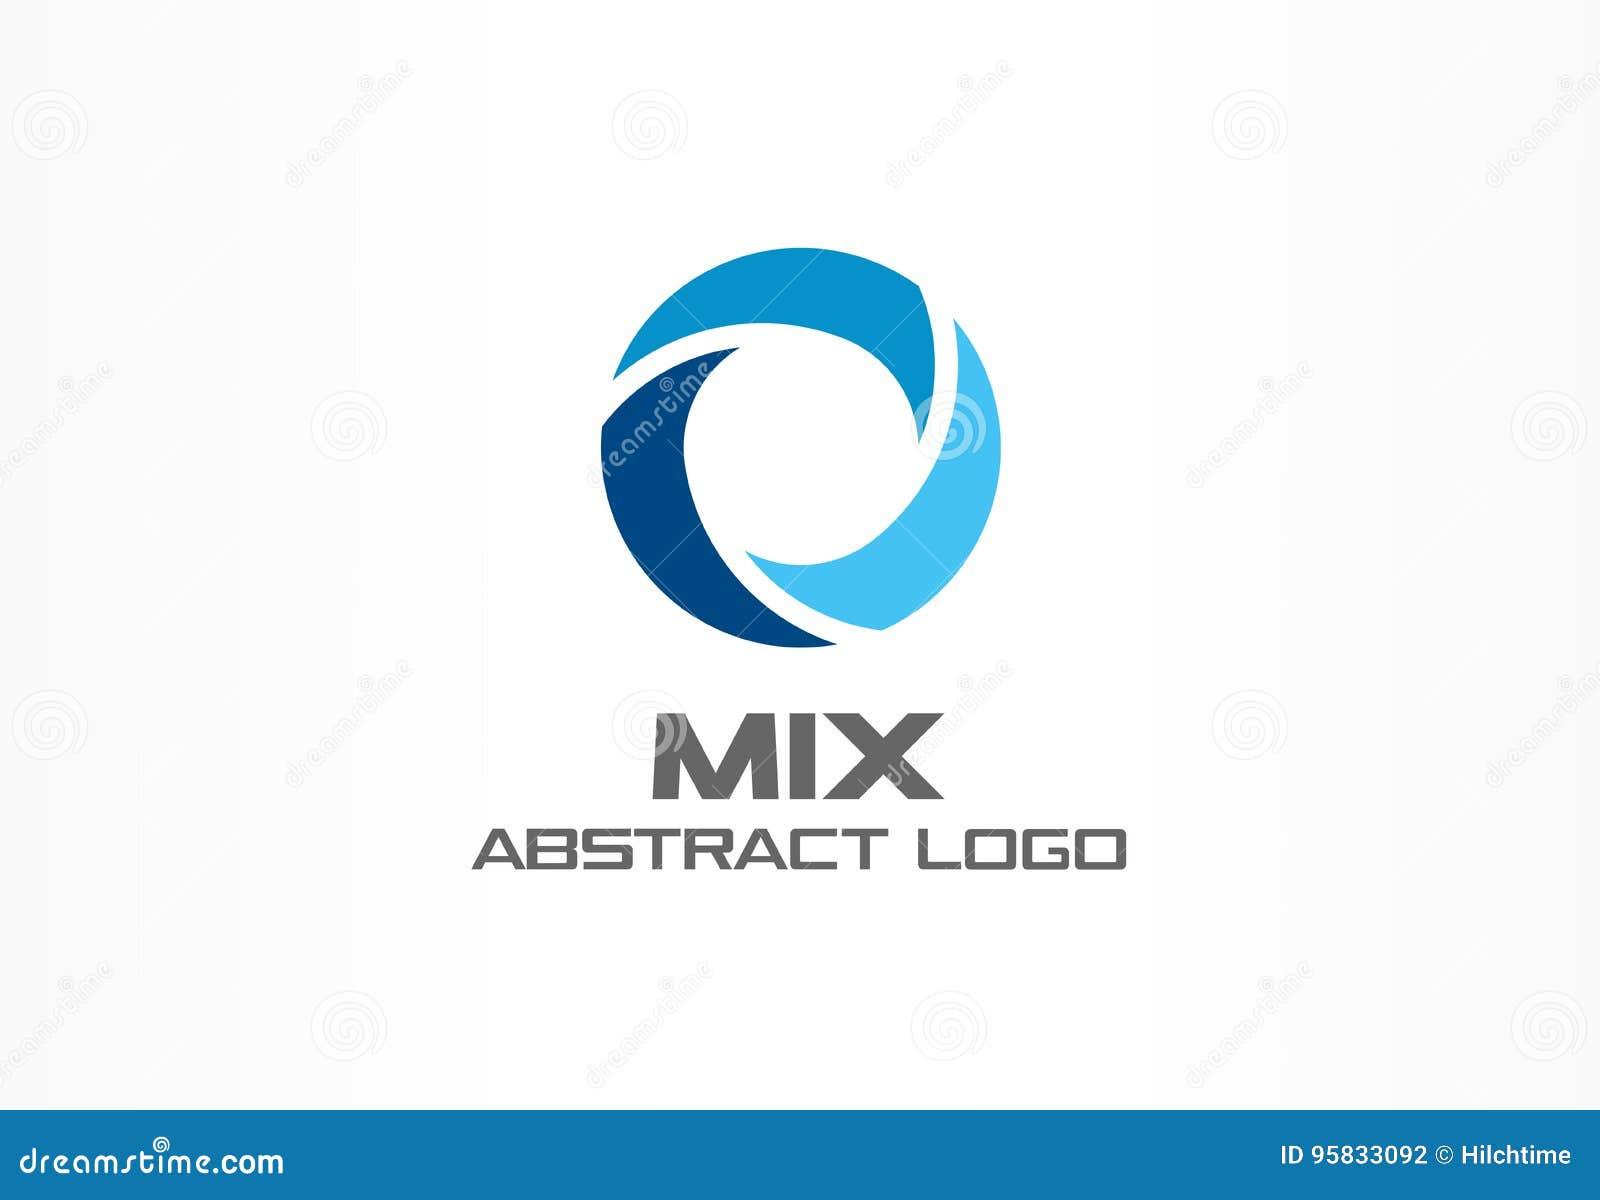 Abstract logo for business company. Corporate identity design element. Globe, teamwork, healthcare, aqua swirl Logotype